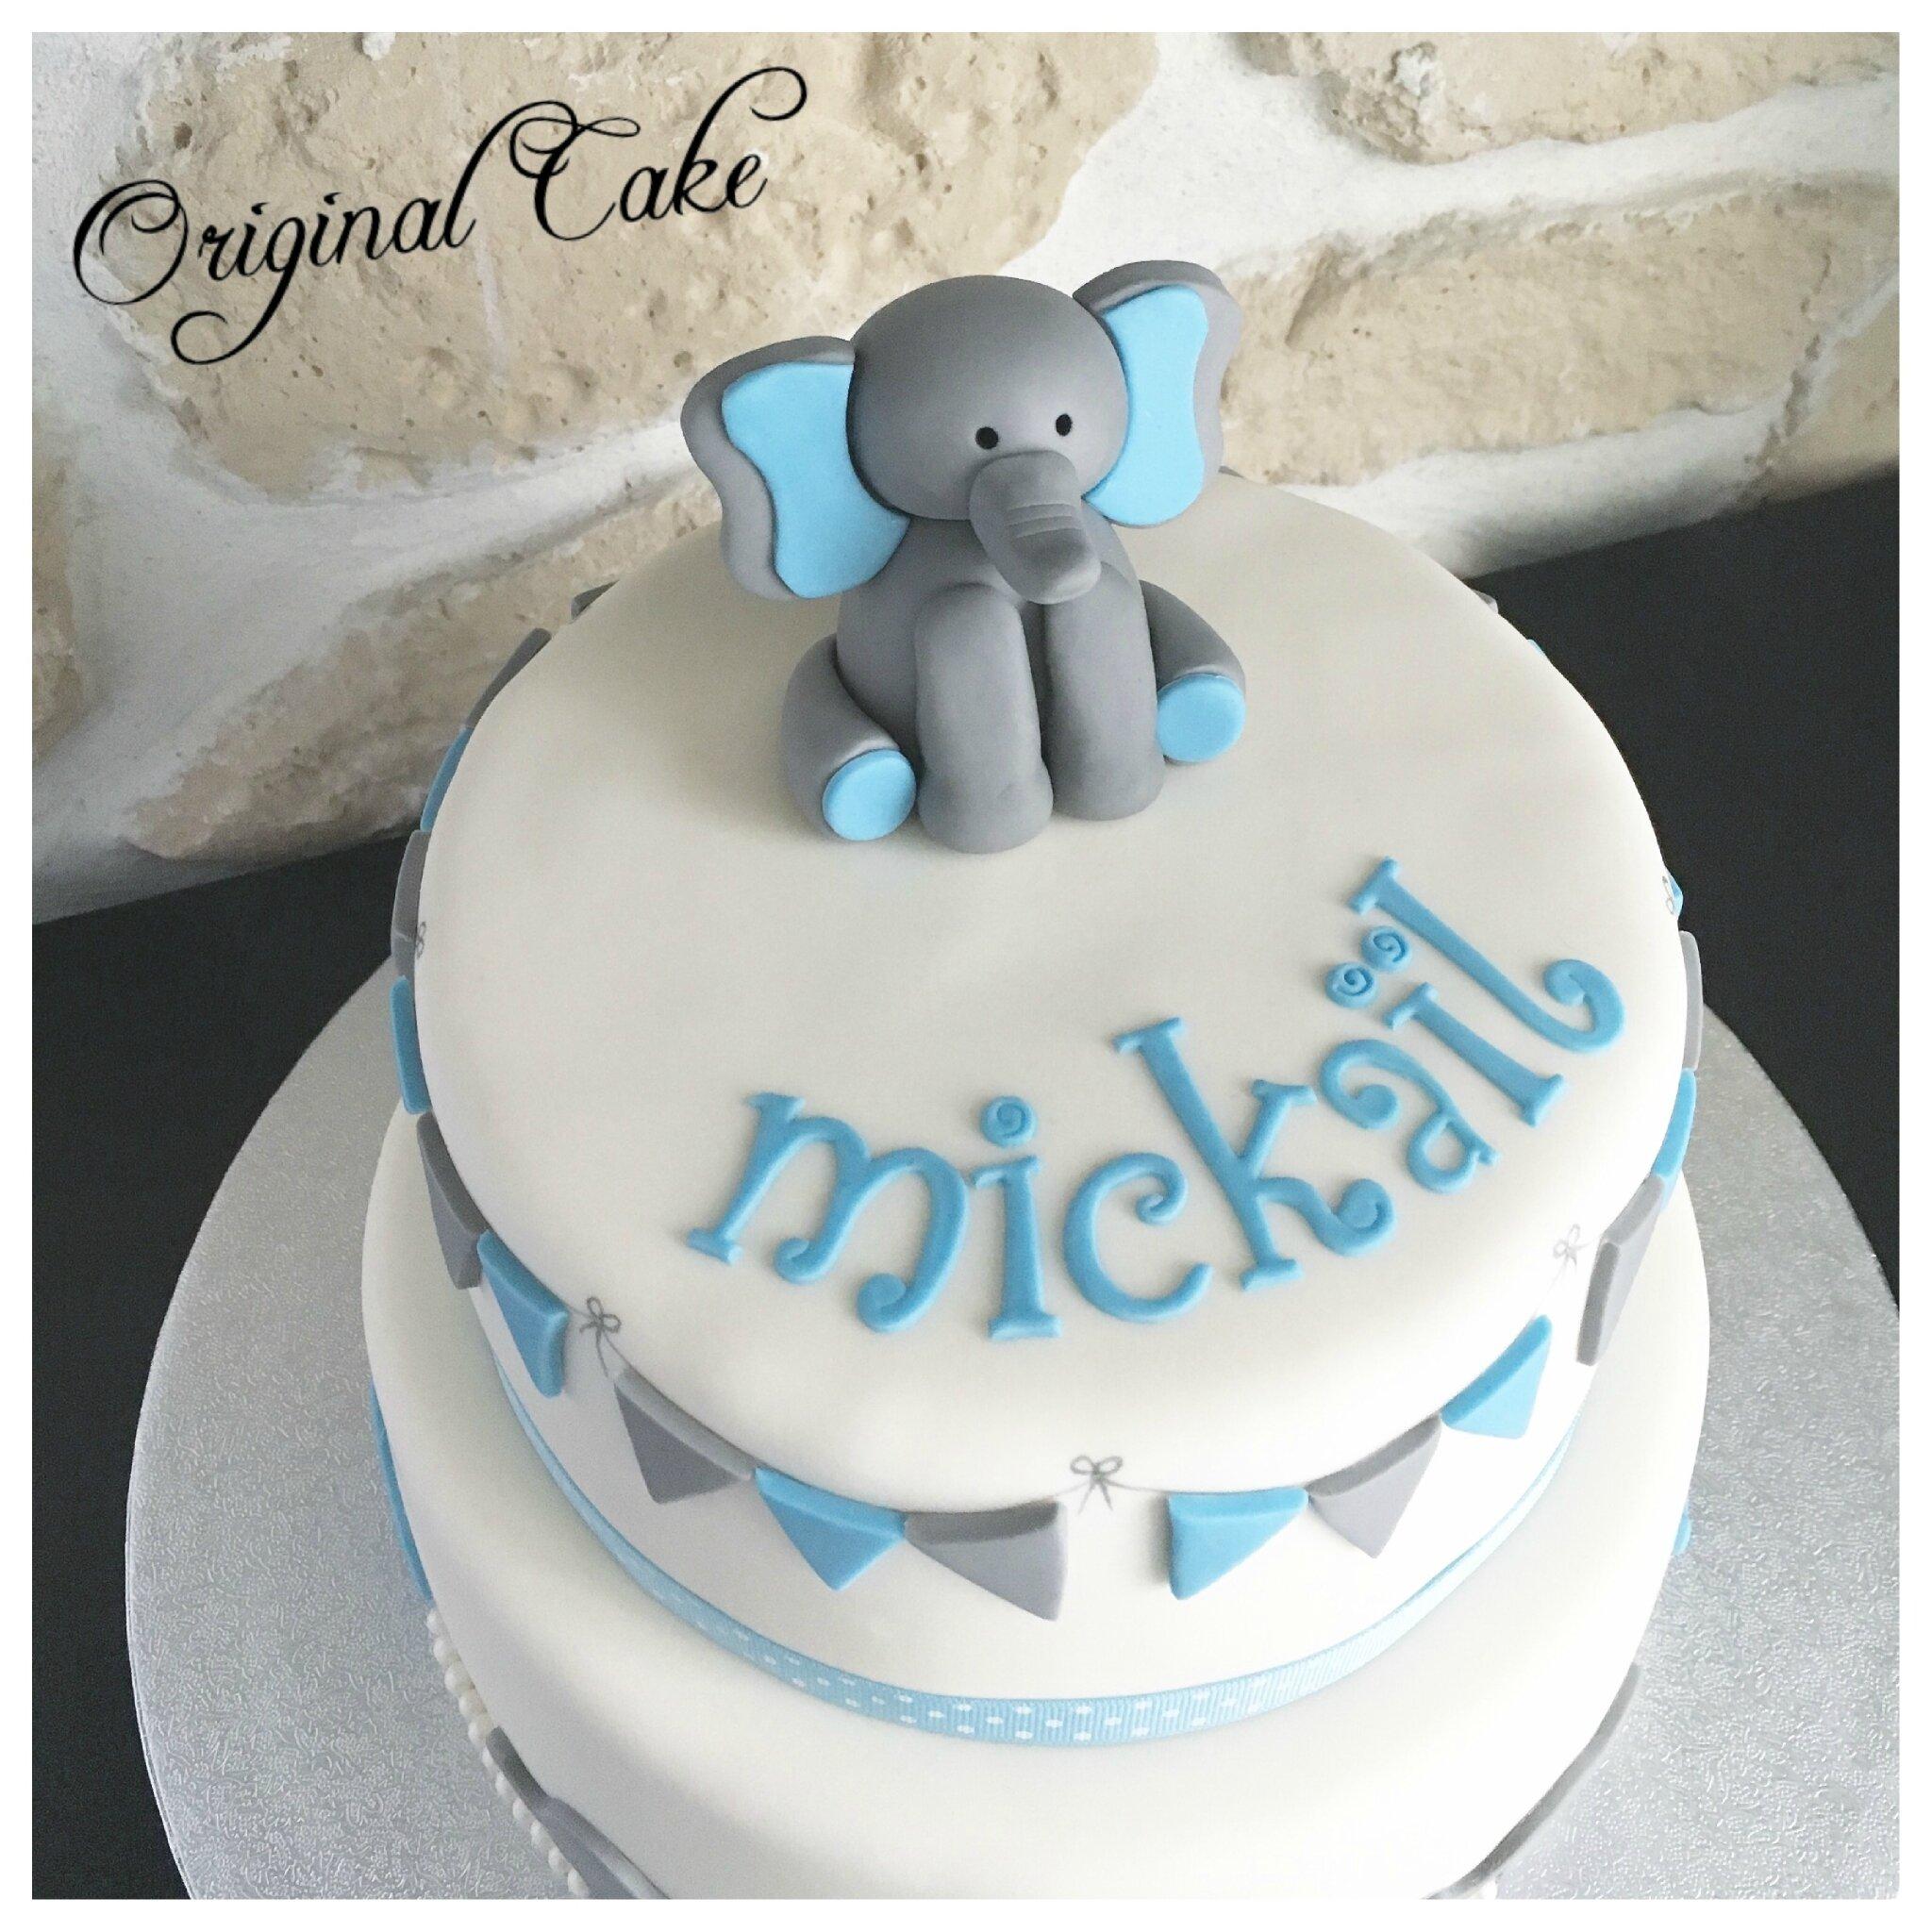 Extrêmement Gâteau naissance garçon - Original Cake TU39